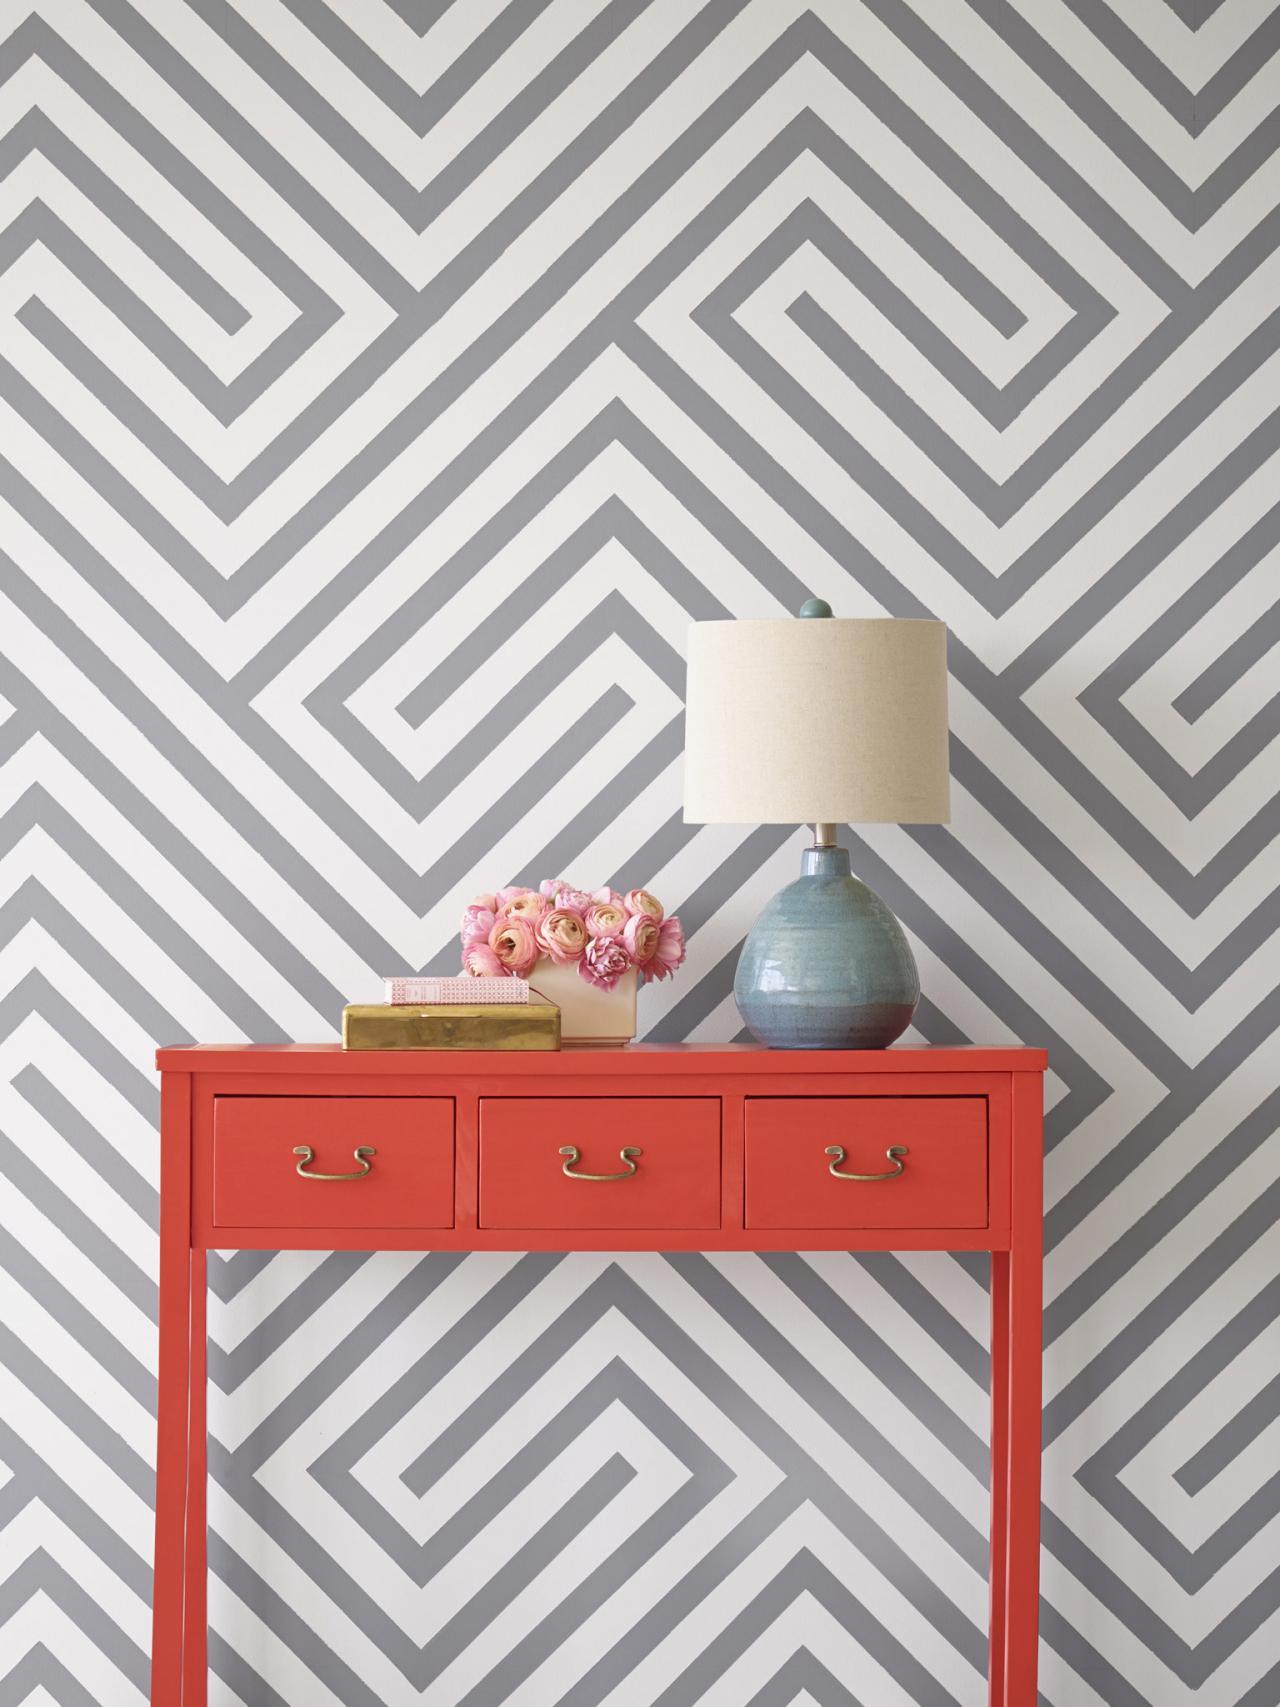 Painting Diagonal Stripes On A Wall Hgtv